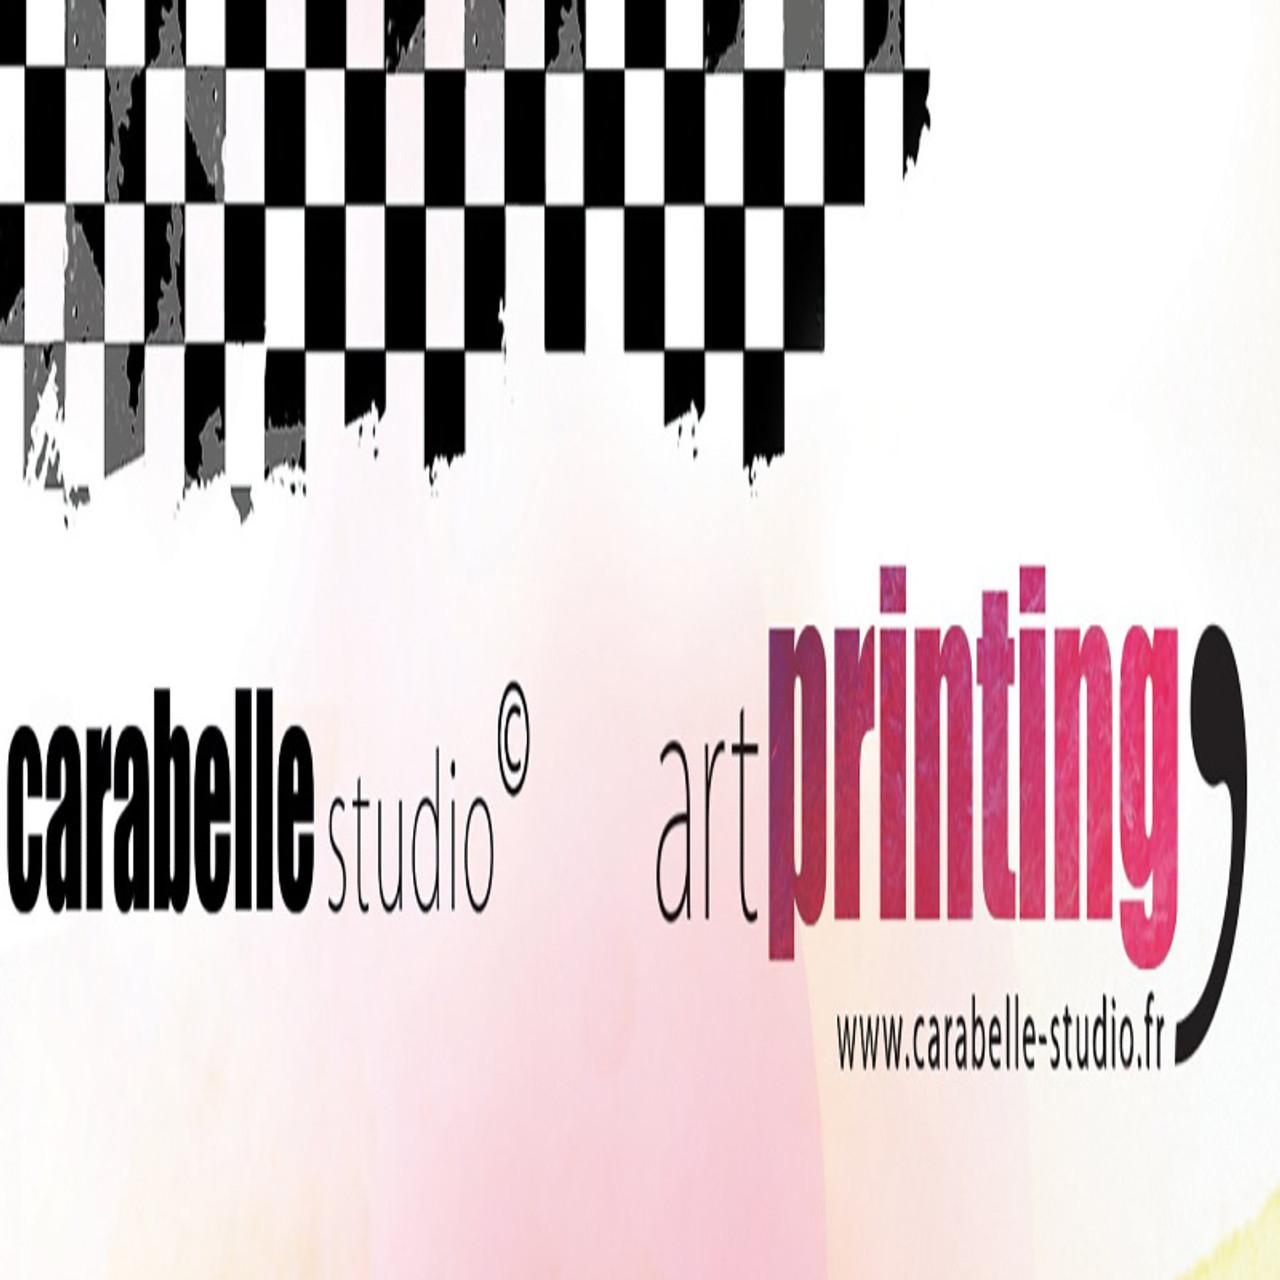 Carabelle Studios